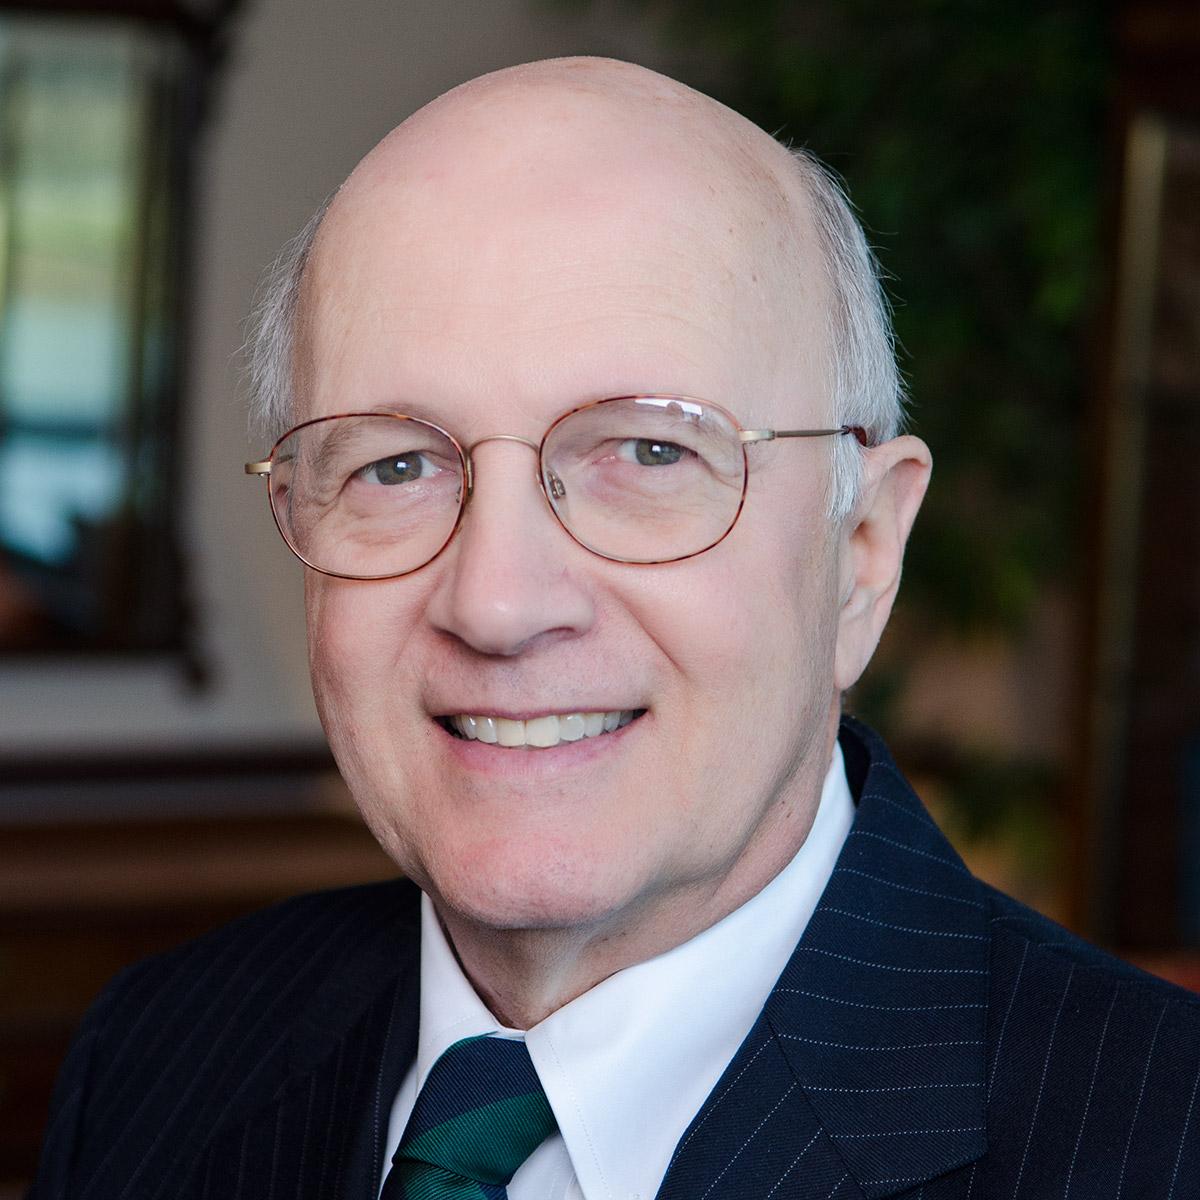 Weaver C. Barksdale, CFA